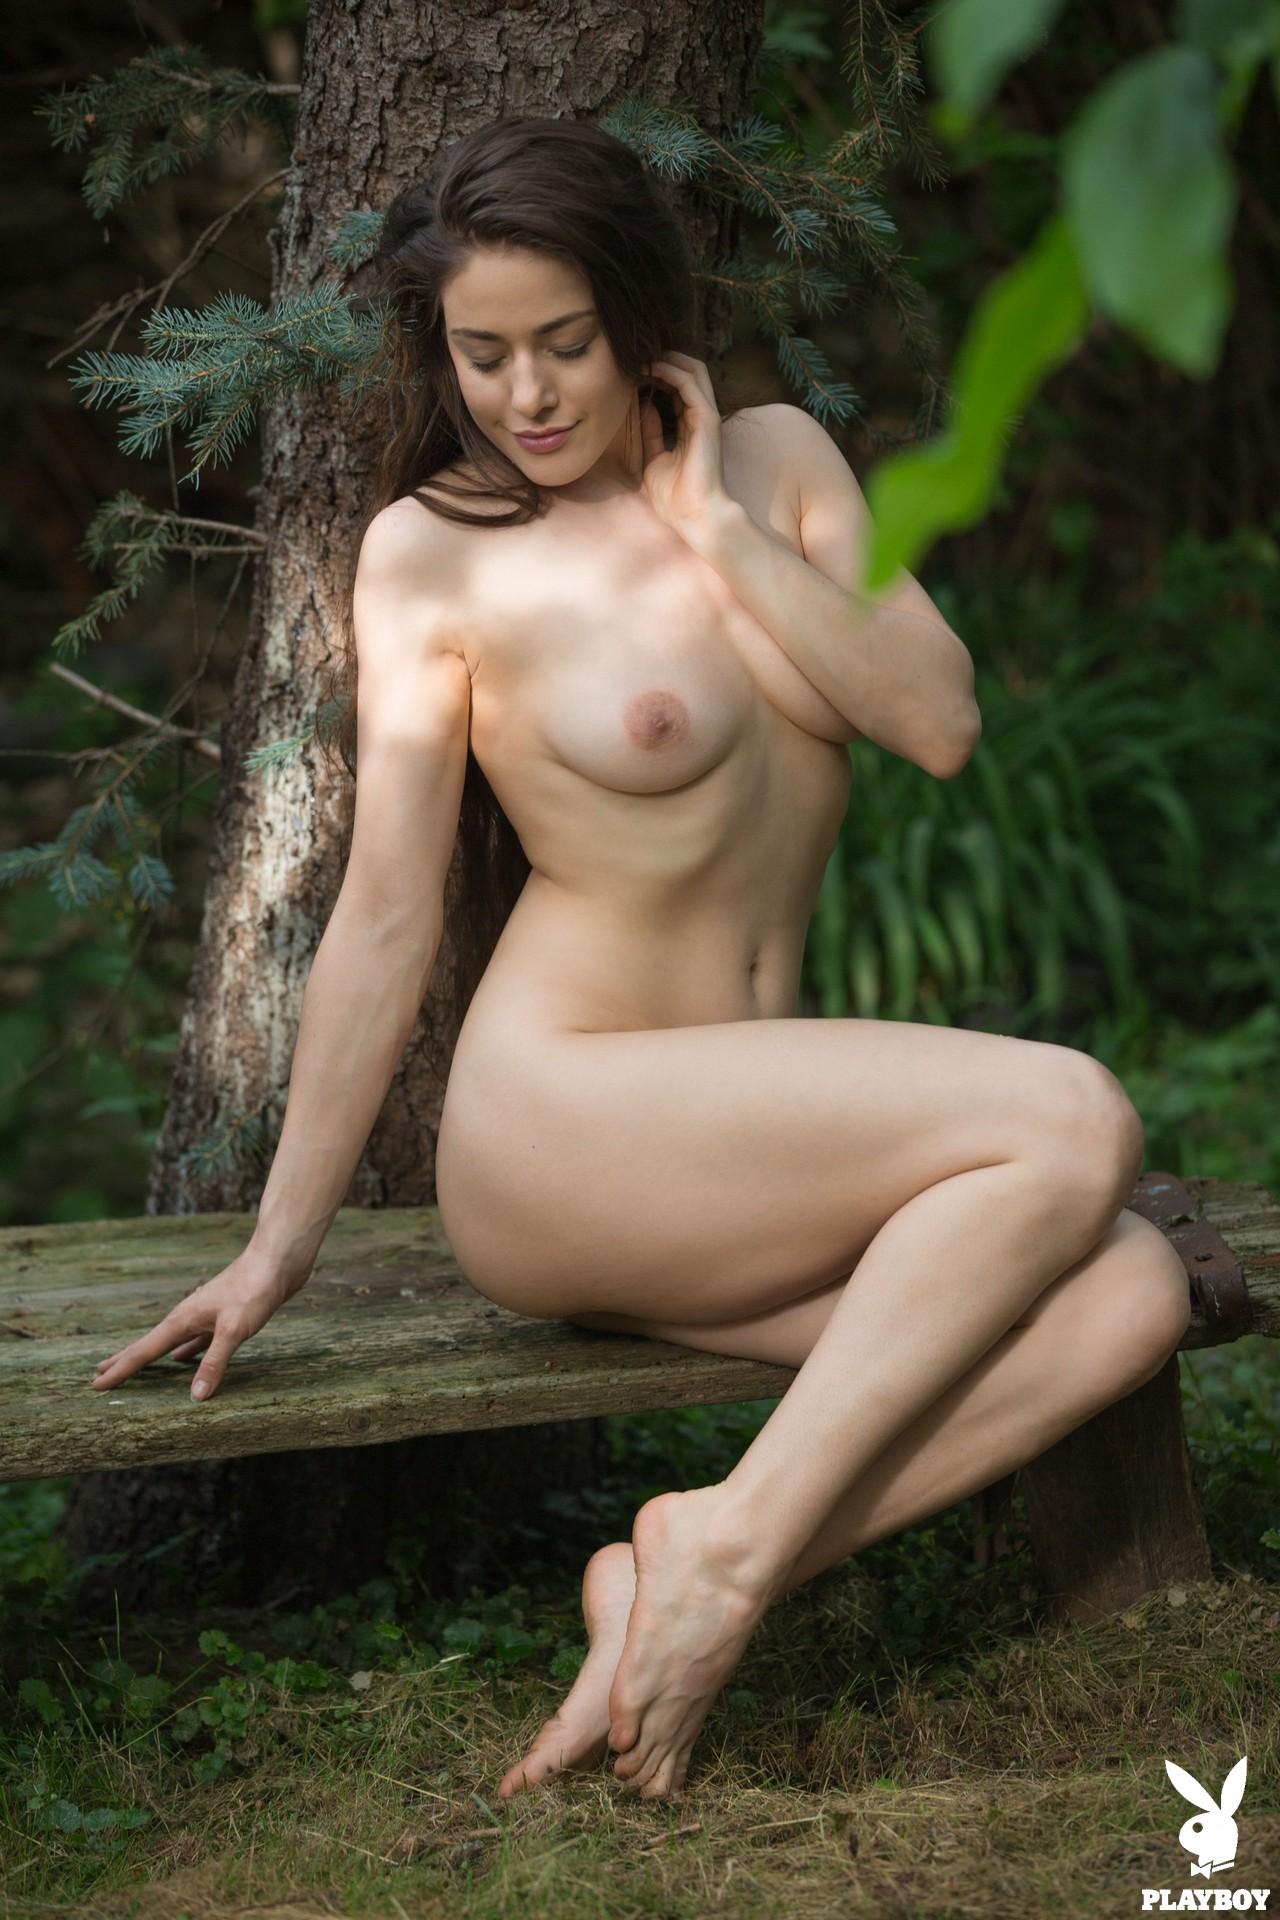 Joy Draiki in Mystic Escape - Playboy Plus 20